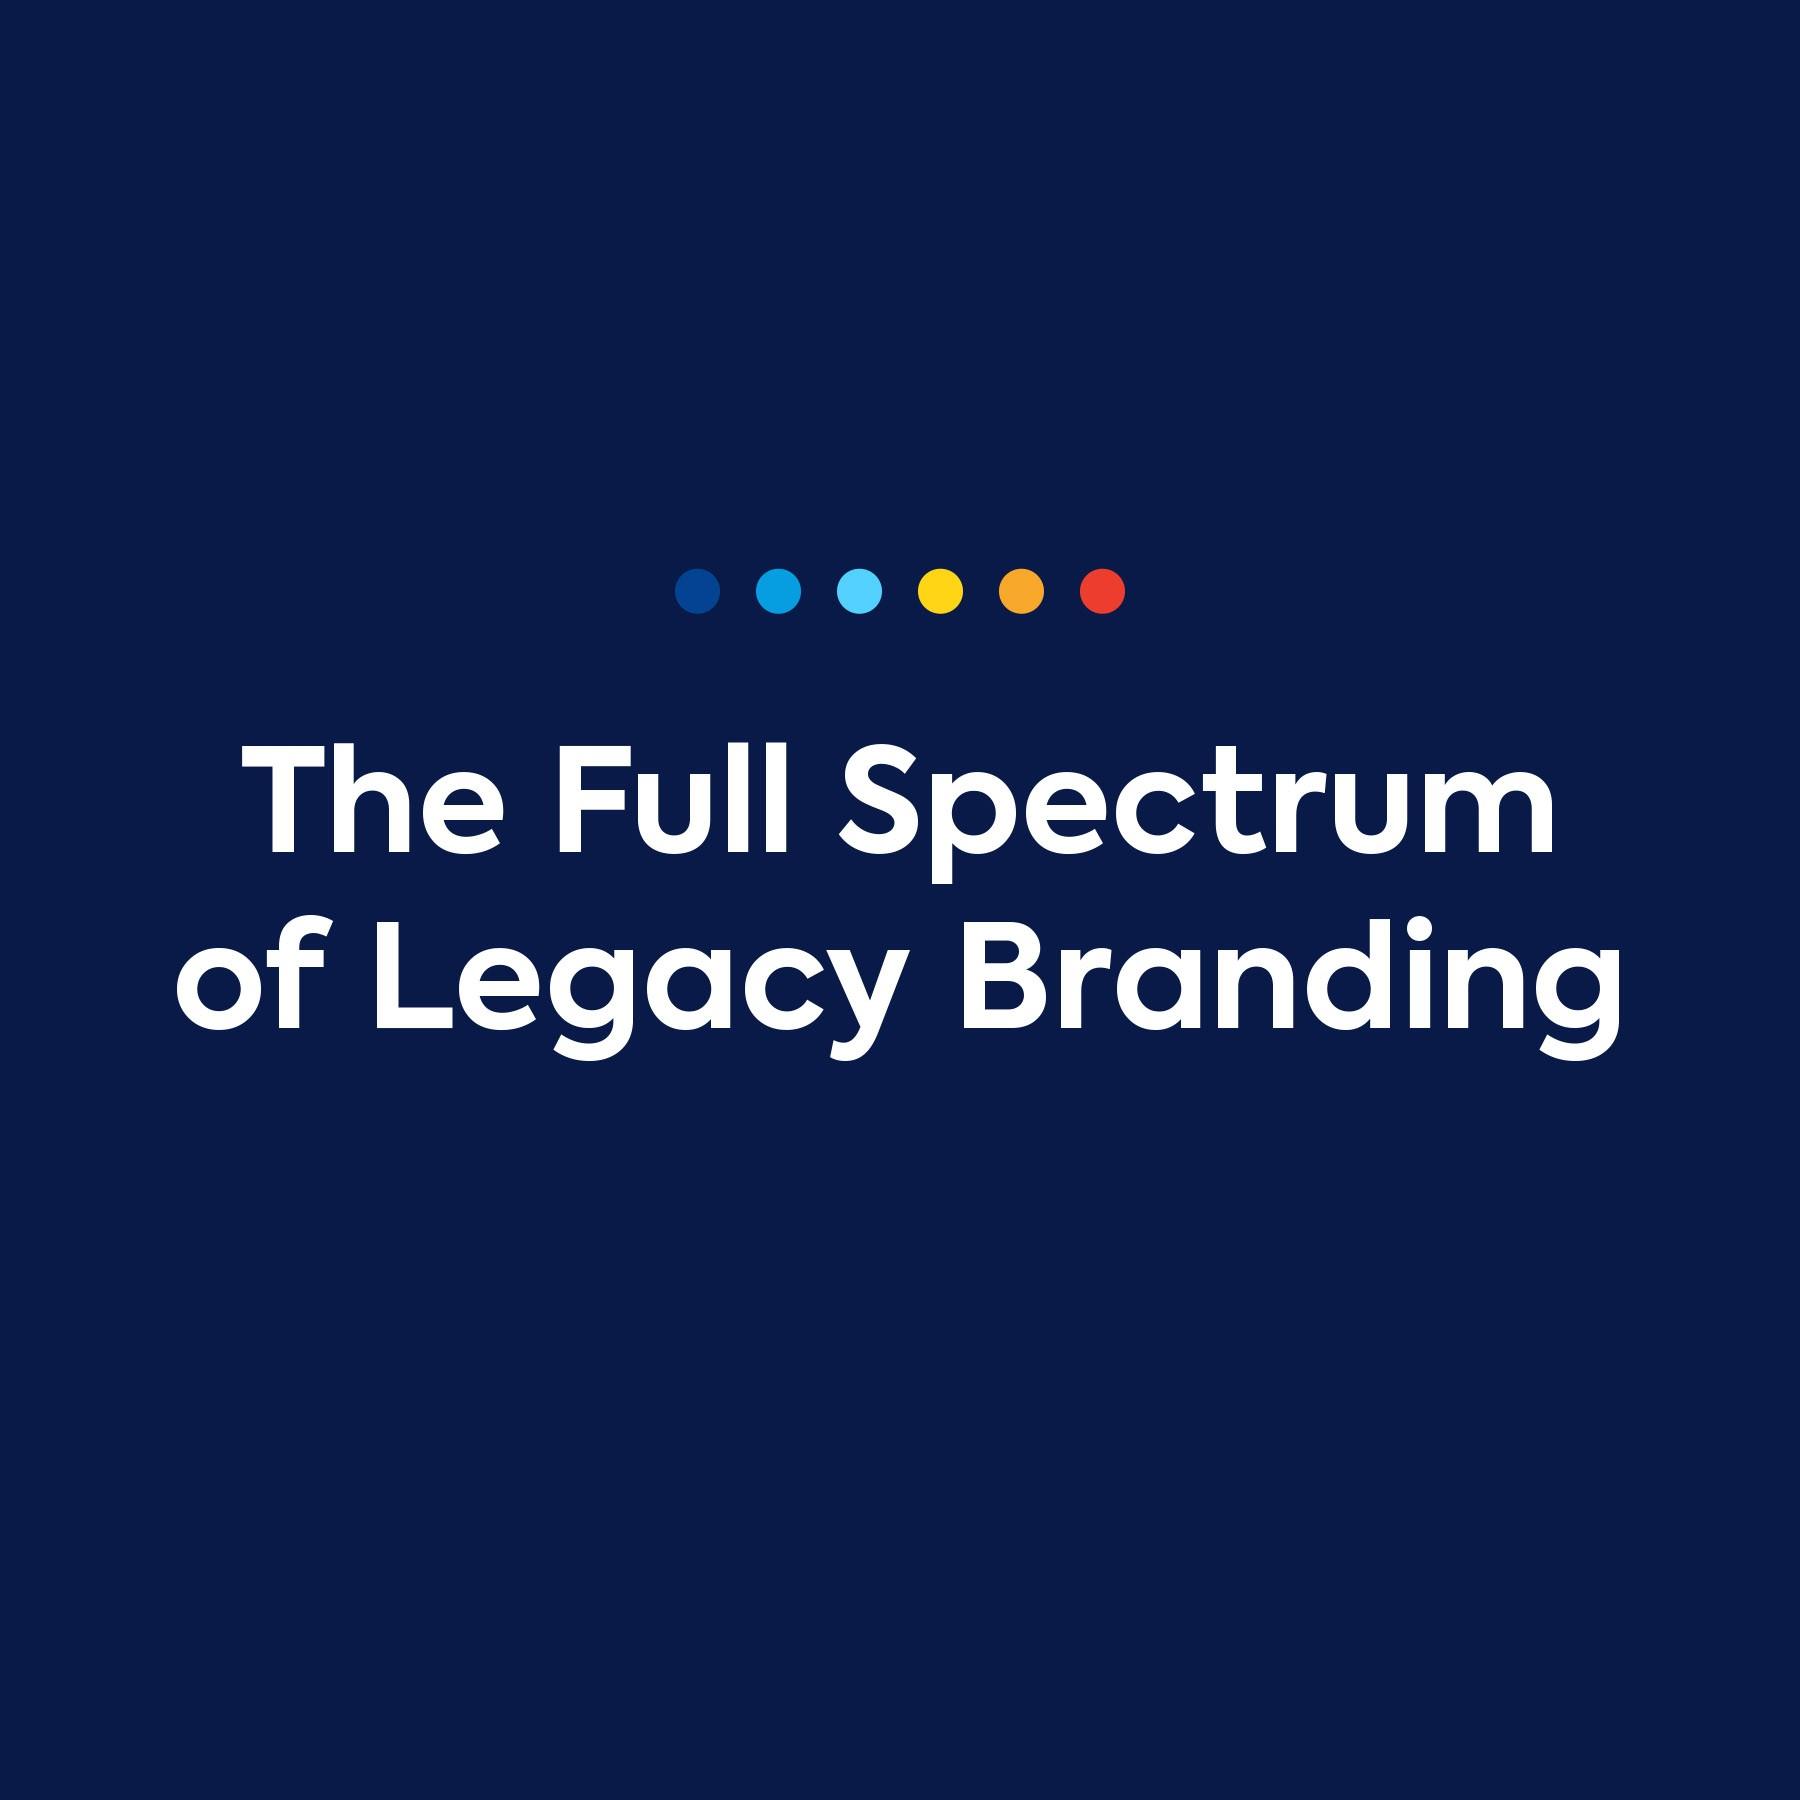 IcyHot The Full Spectrum of Legacy Branding